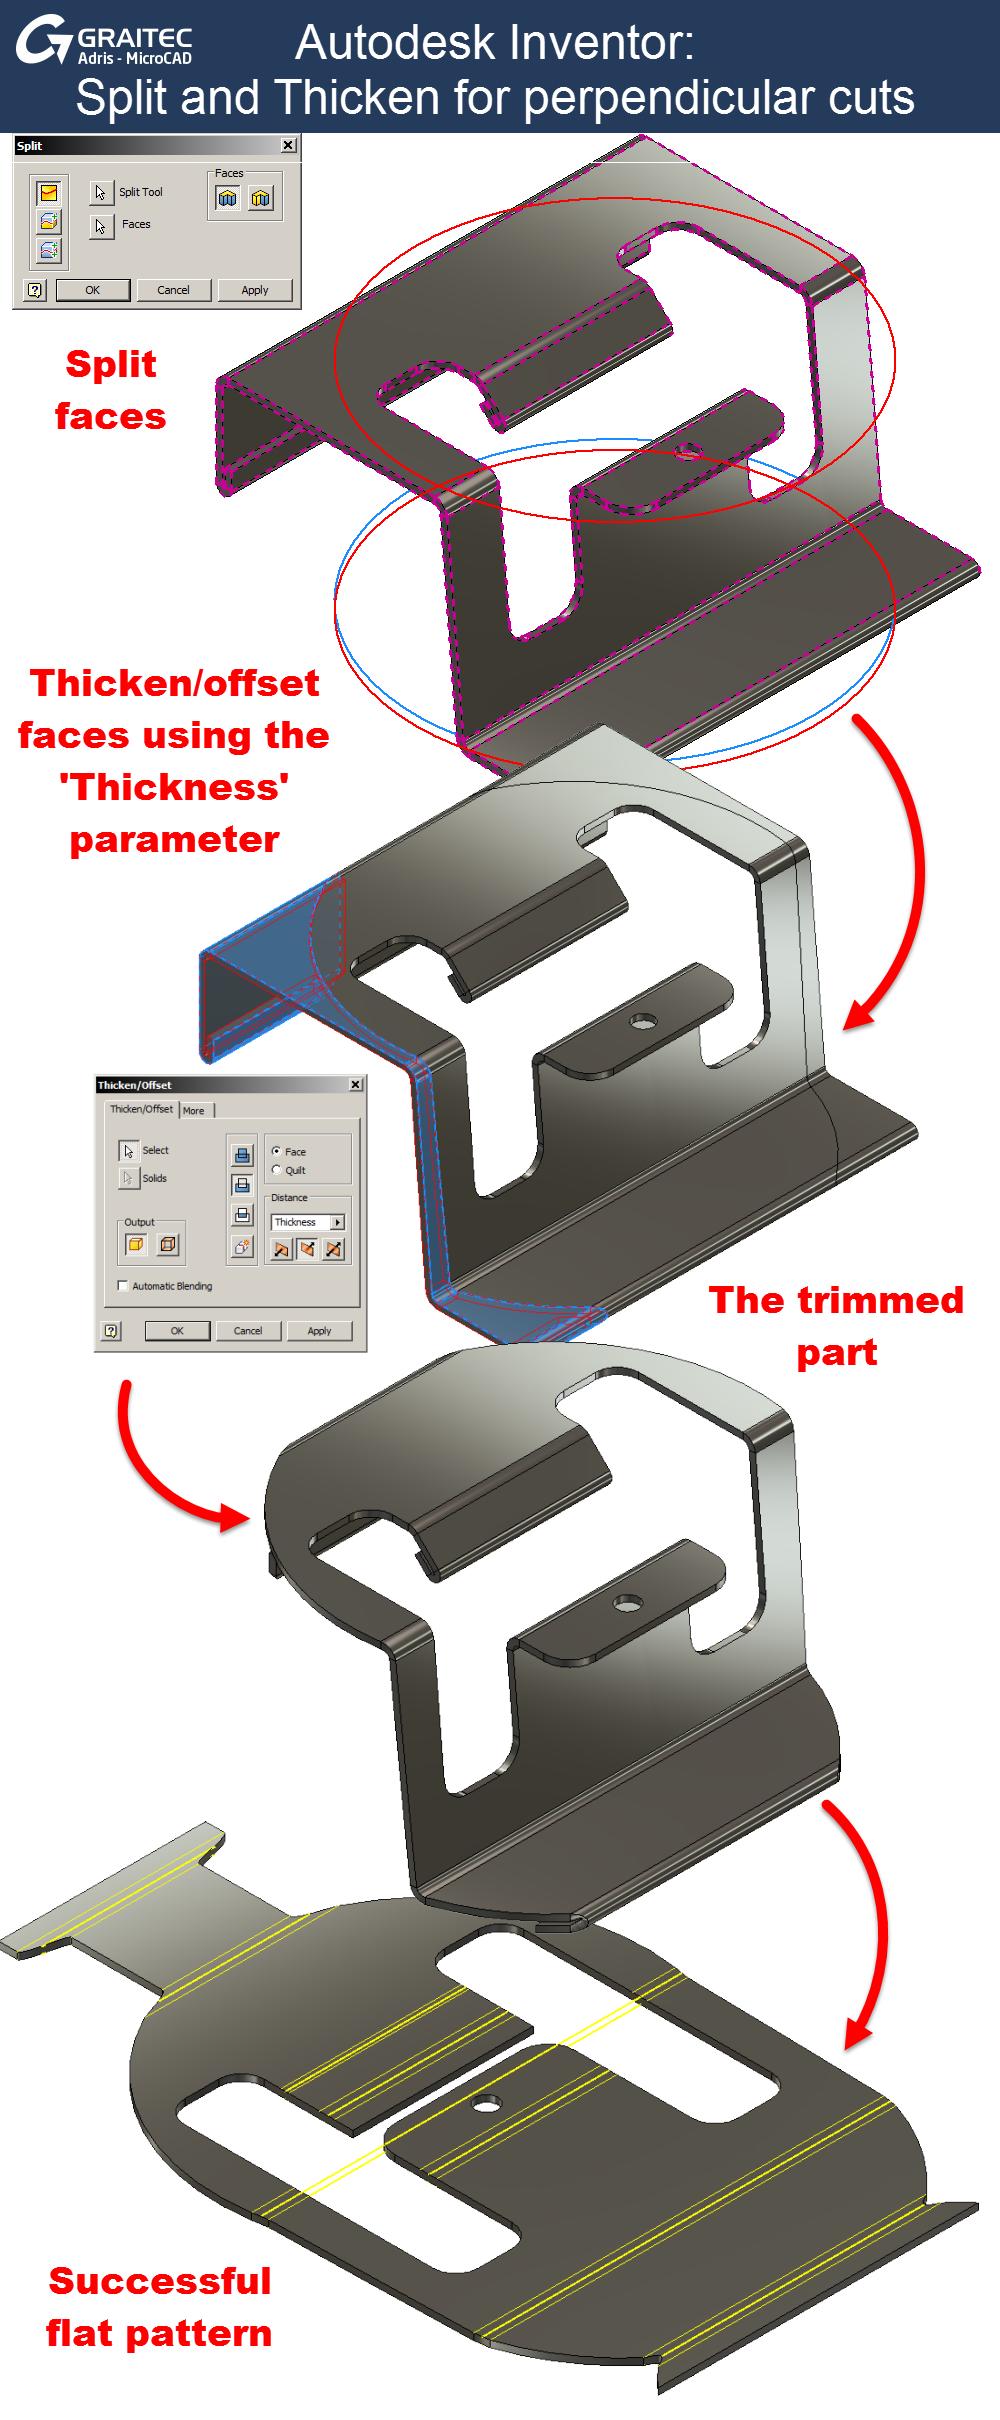 Autodesk Inventor Sheet Metal Flat Pattern Success Tole Pliee Pliage Tole Tole